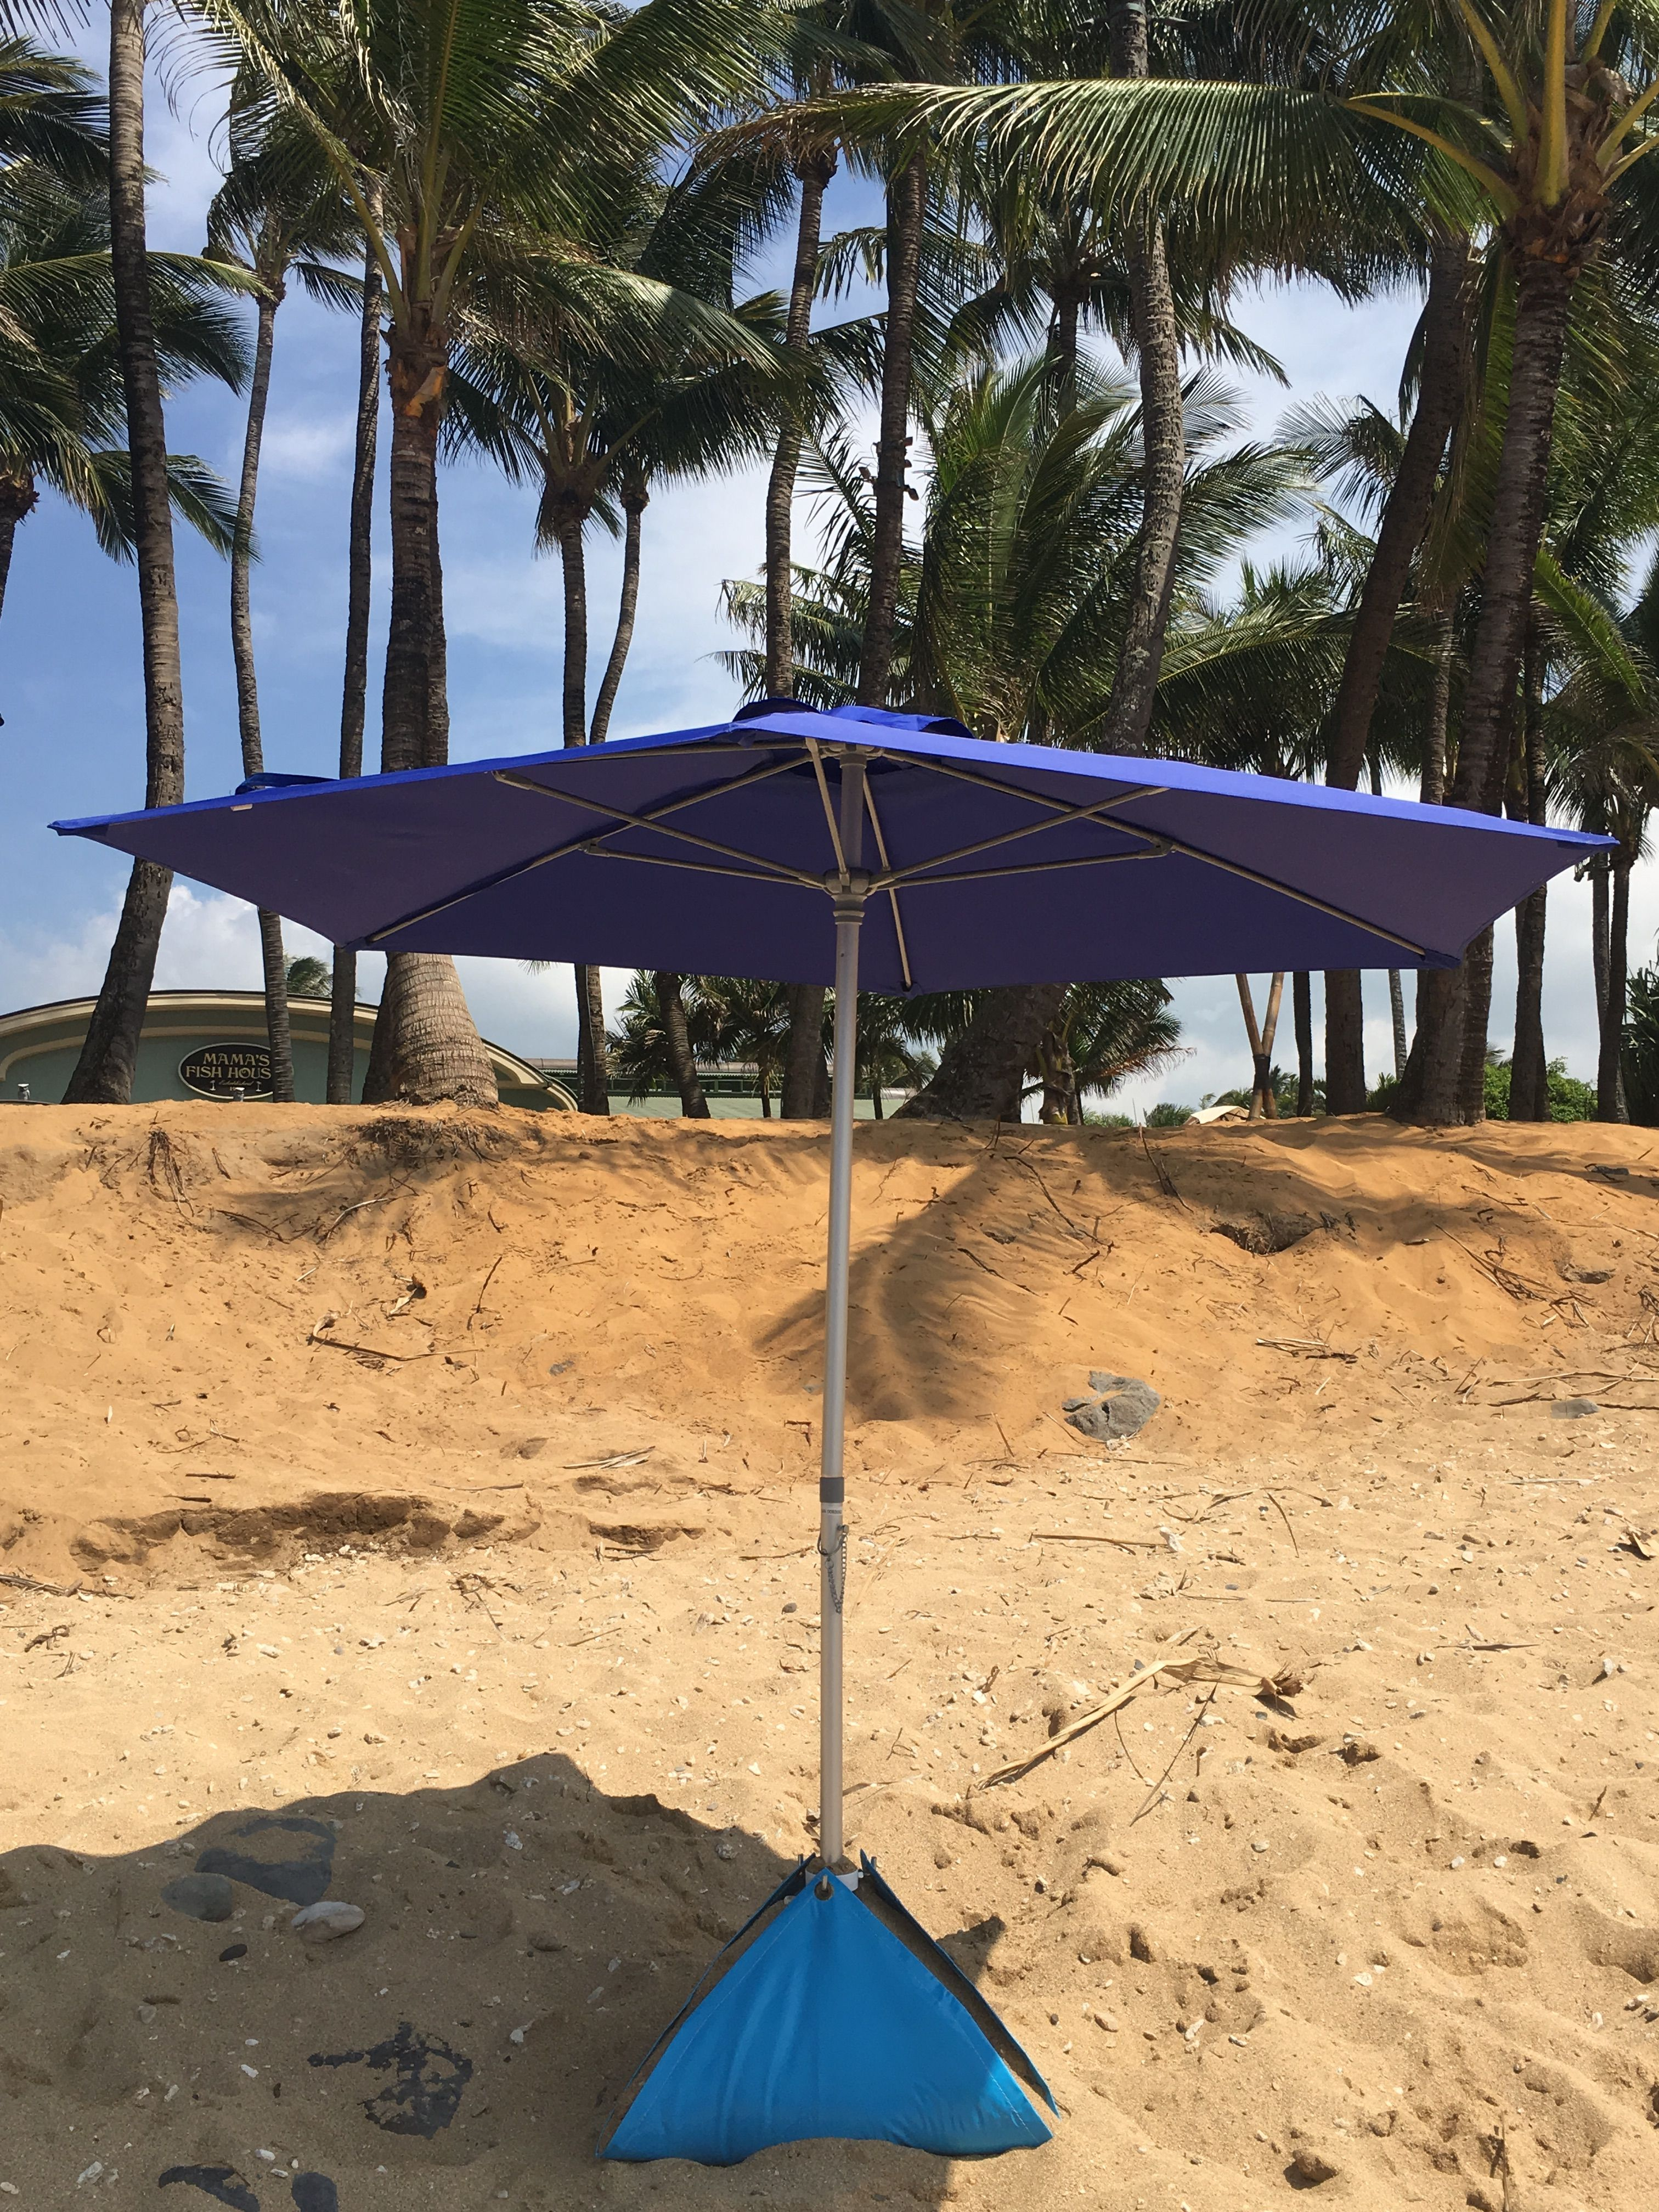 Pin By Beachbub Usa On Hawaii Beachbub